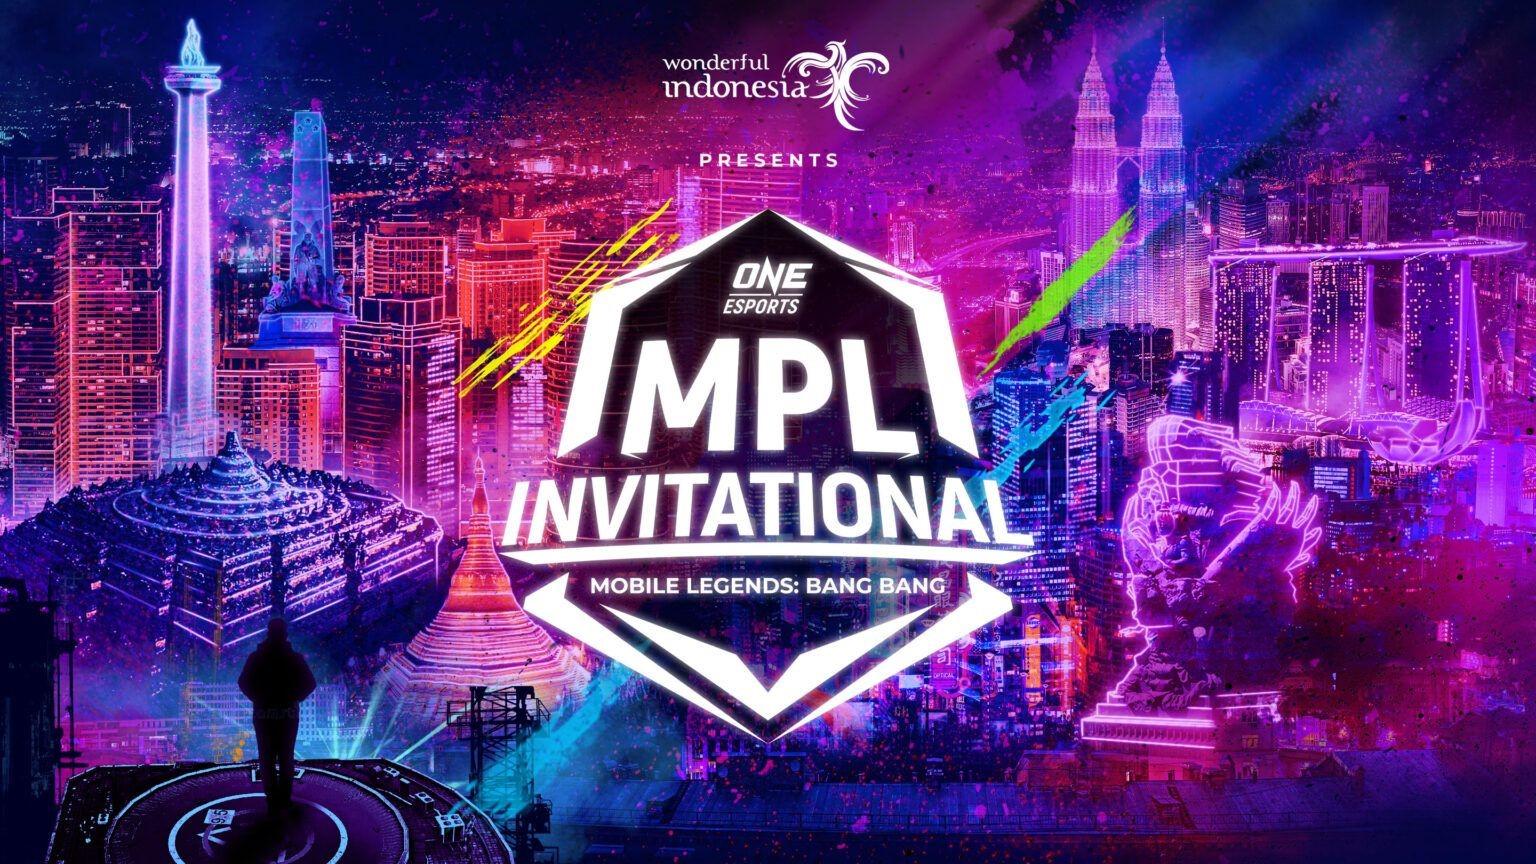 Esport MPL Invitational, Mobile Legends Indonesia